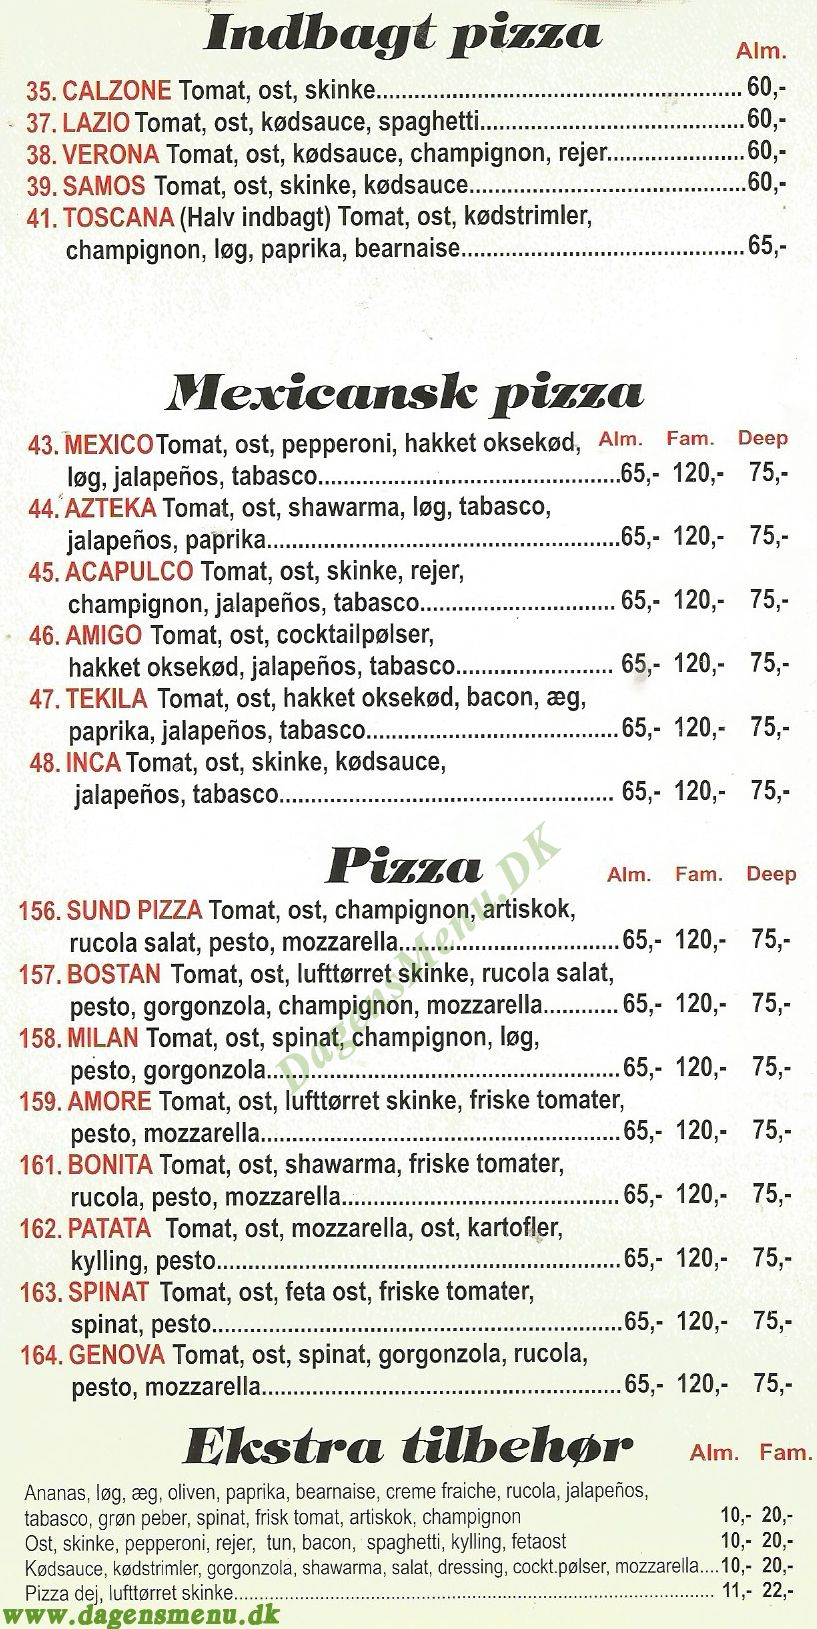 Picasso Pizza - Menukort